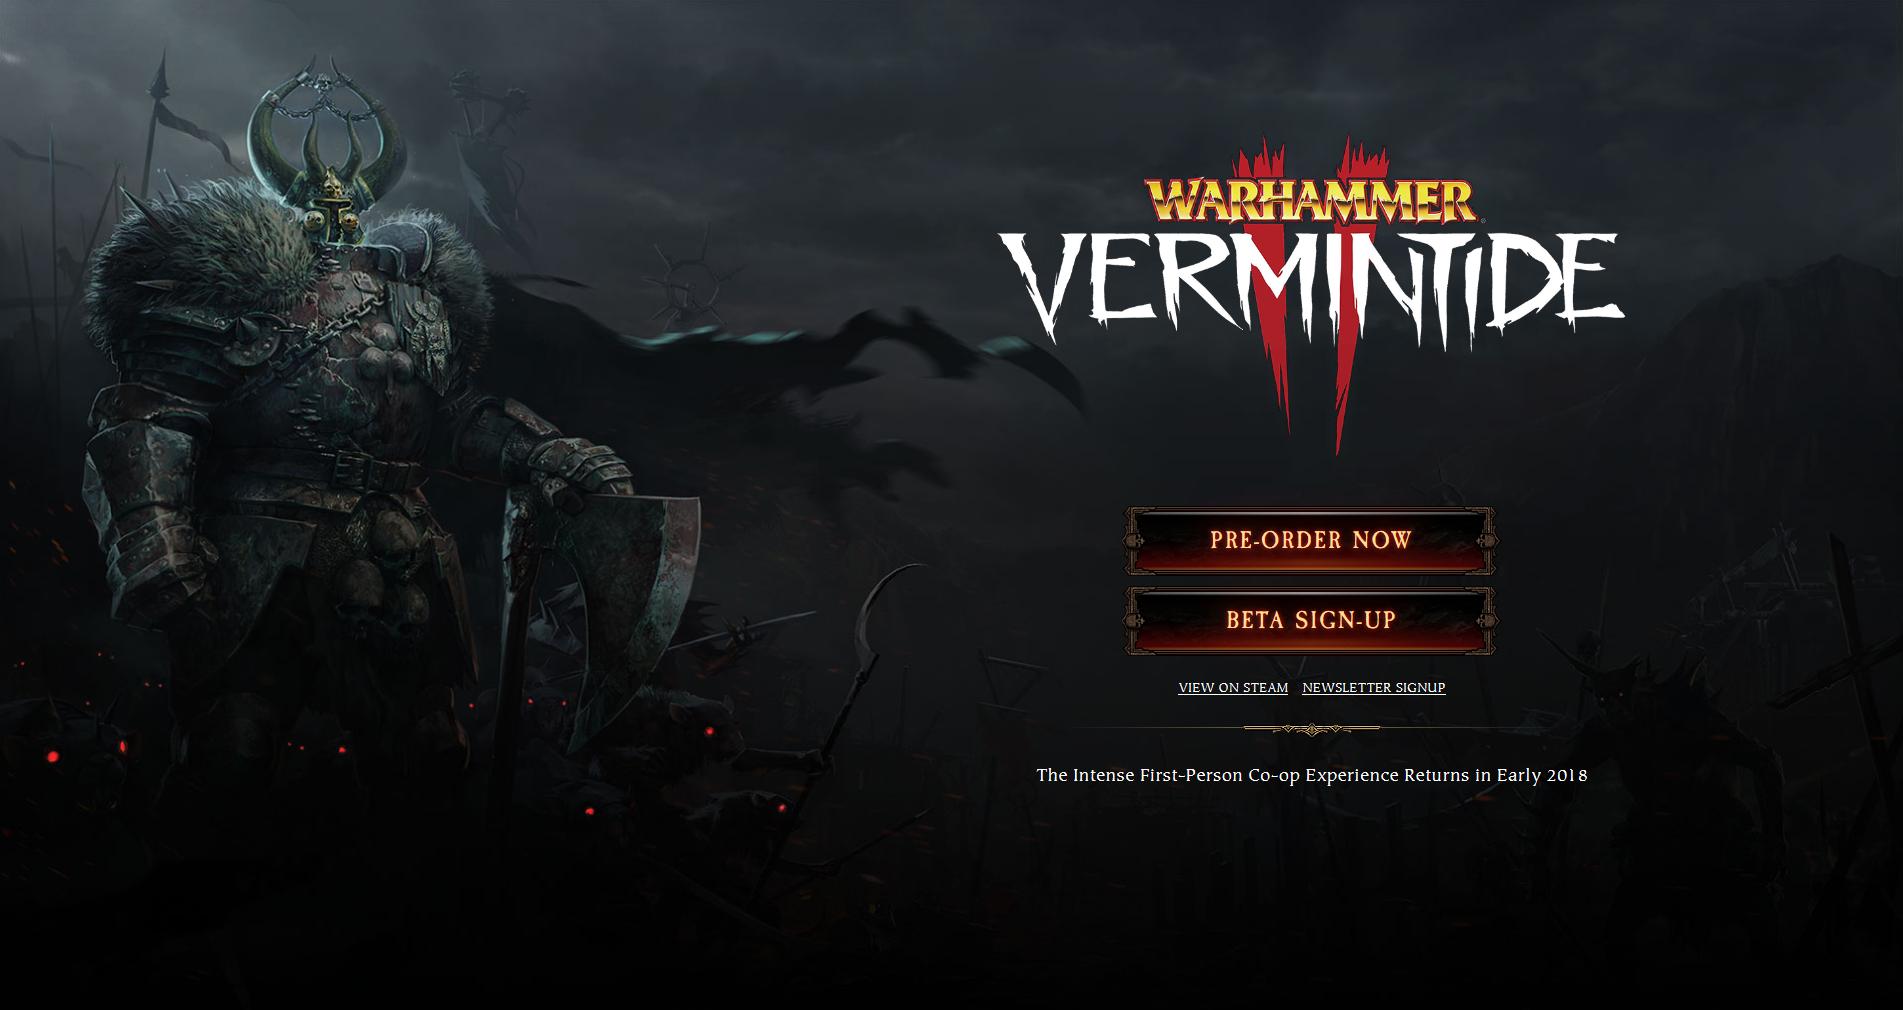 FireShot Capture 6 - Warhammer Vermintide 2 - Fatshark - http___www.vermintide.com_.png